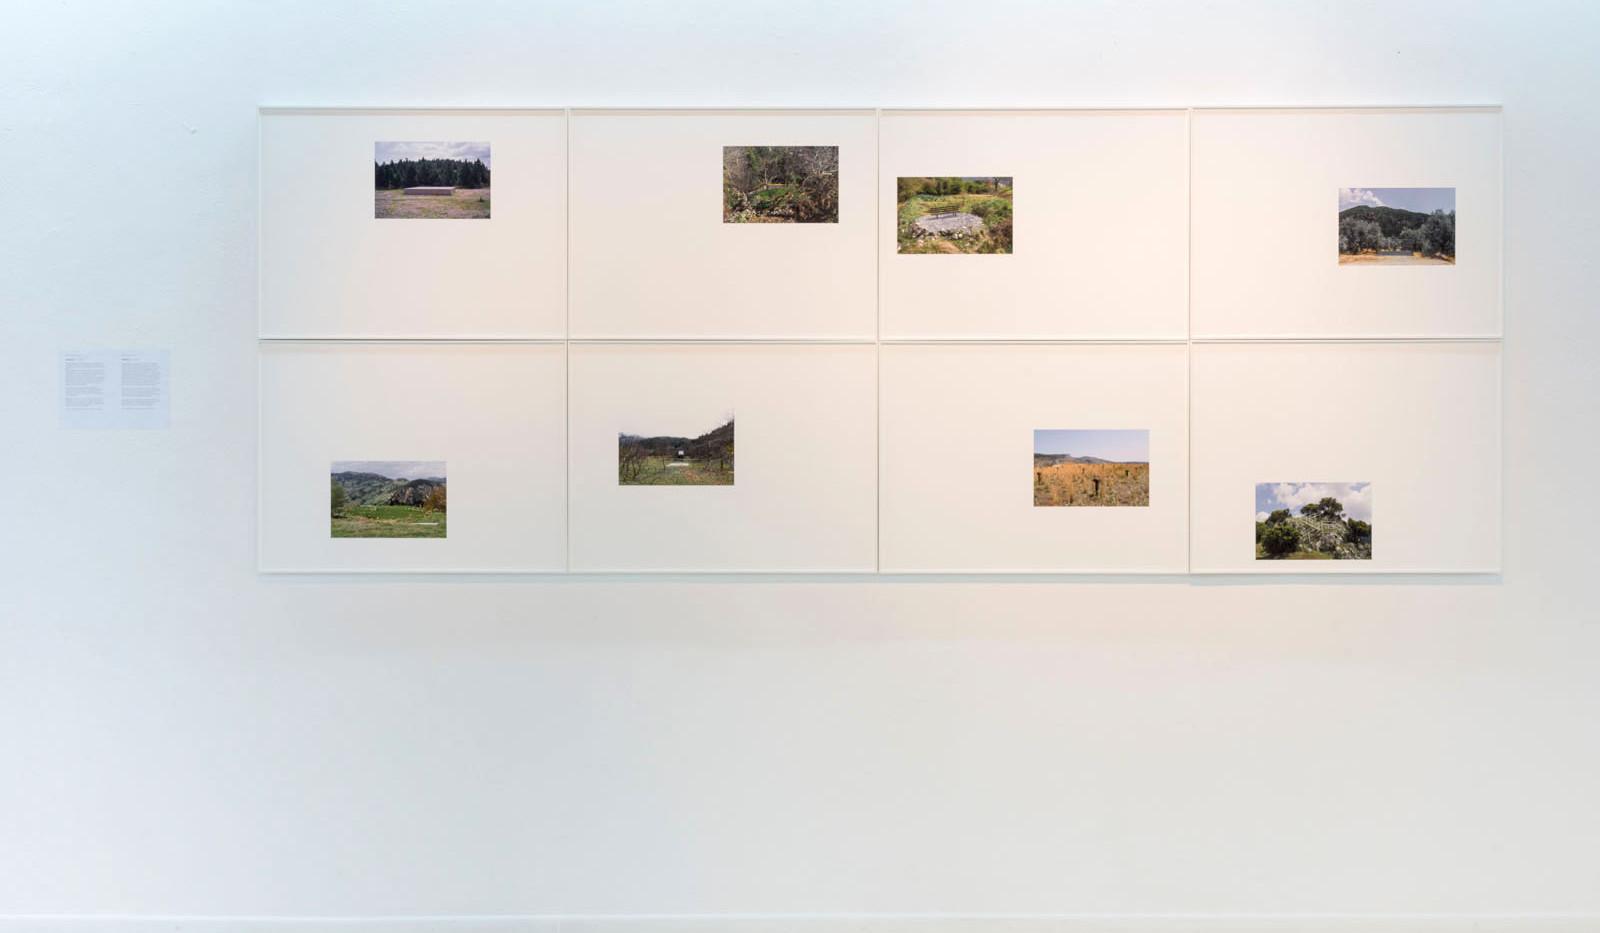 "Exhibition ""The Provinces"" at TAF, Athens, 2019. Christos Sotiropoulos, ""Aloofland""   Έκθεση ""The Provinces"", TAF Τhe Art Foundation, Αθήνα, 2019, Χρήστος Σωτηρόπουλος, ""Aloofland""."